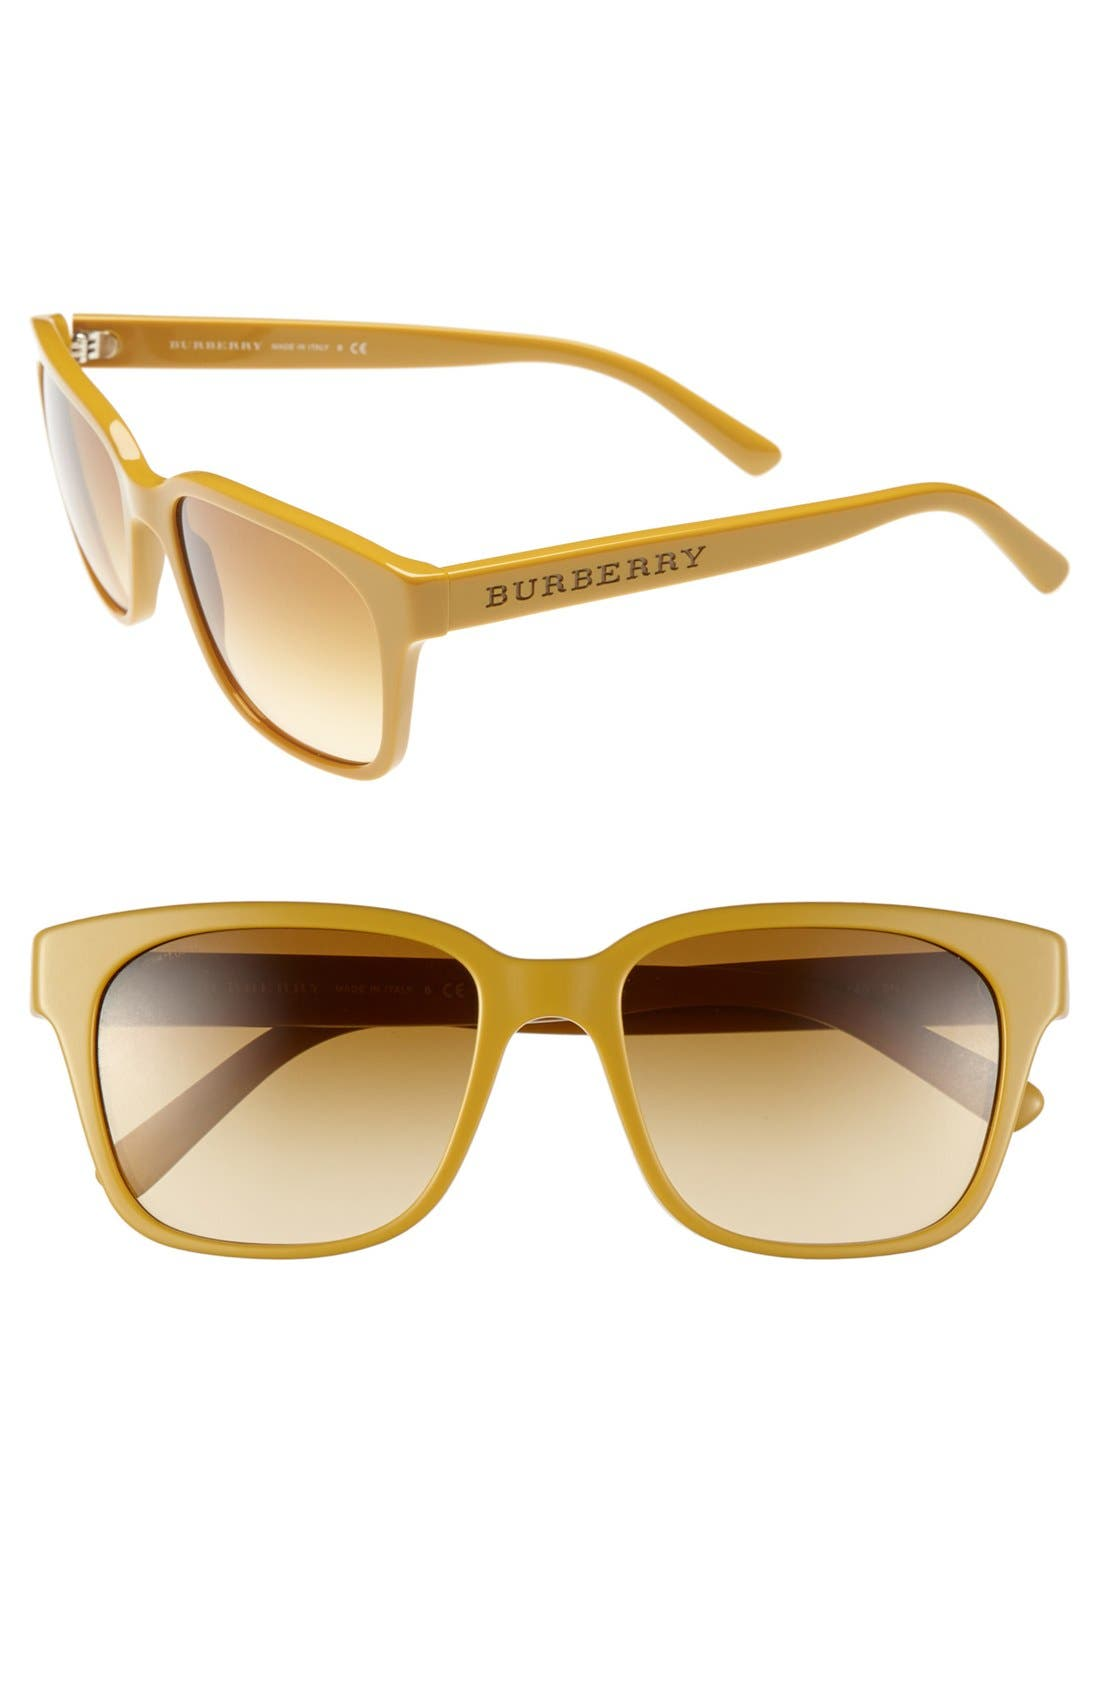 Alternate Image 1 Selected - Burberry 'Splash' 55mm Sunglasses